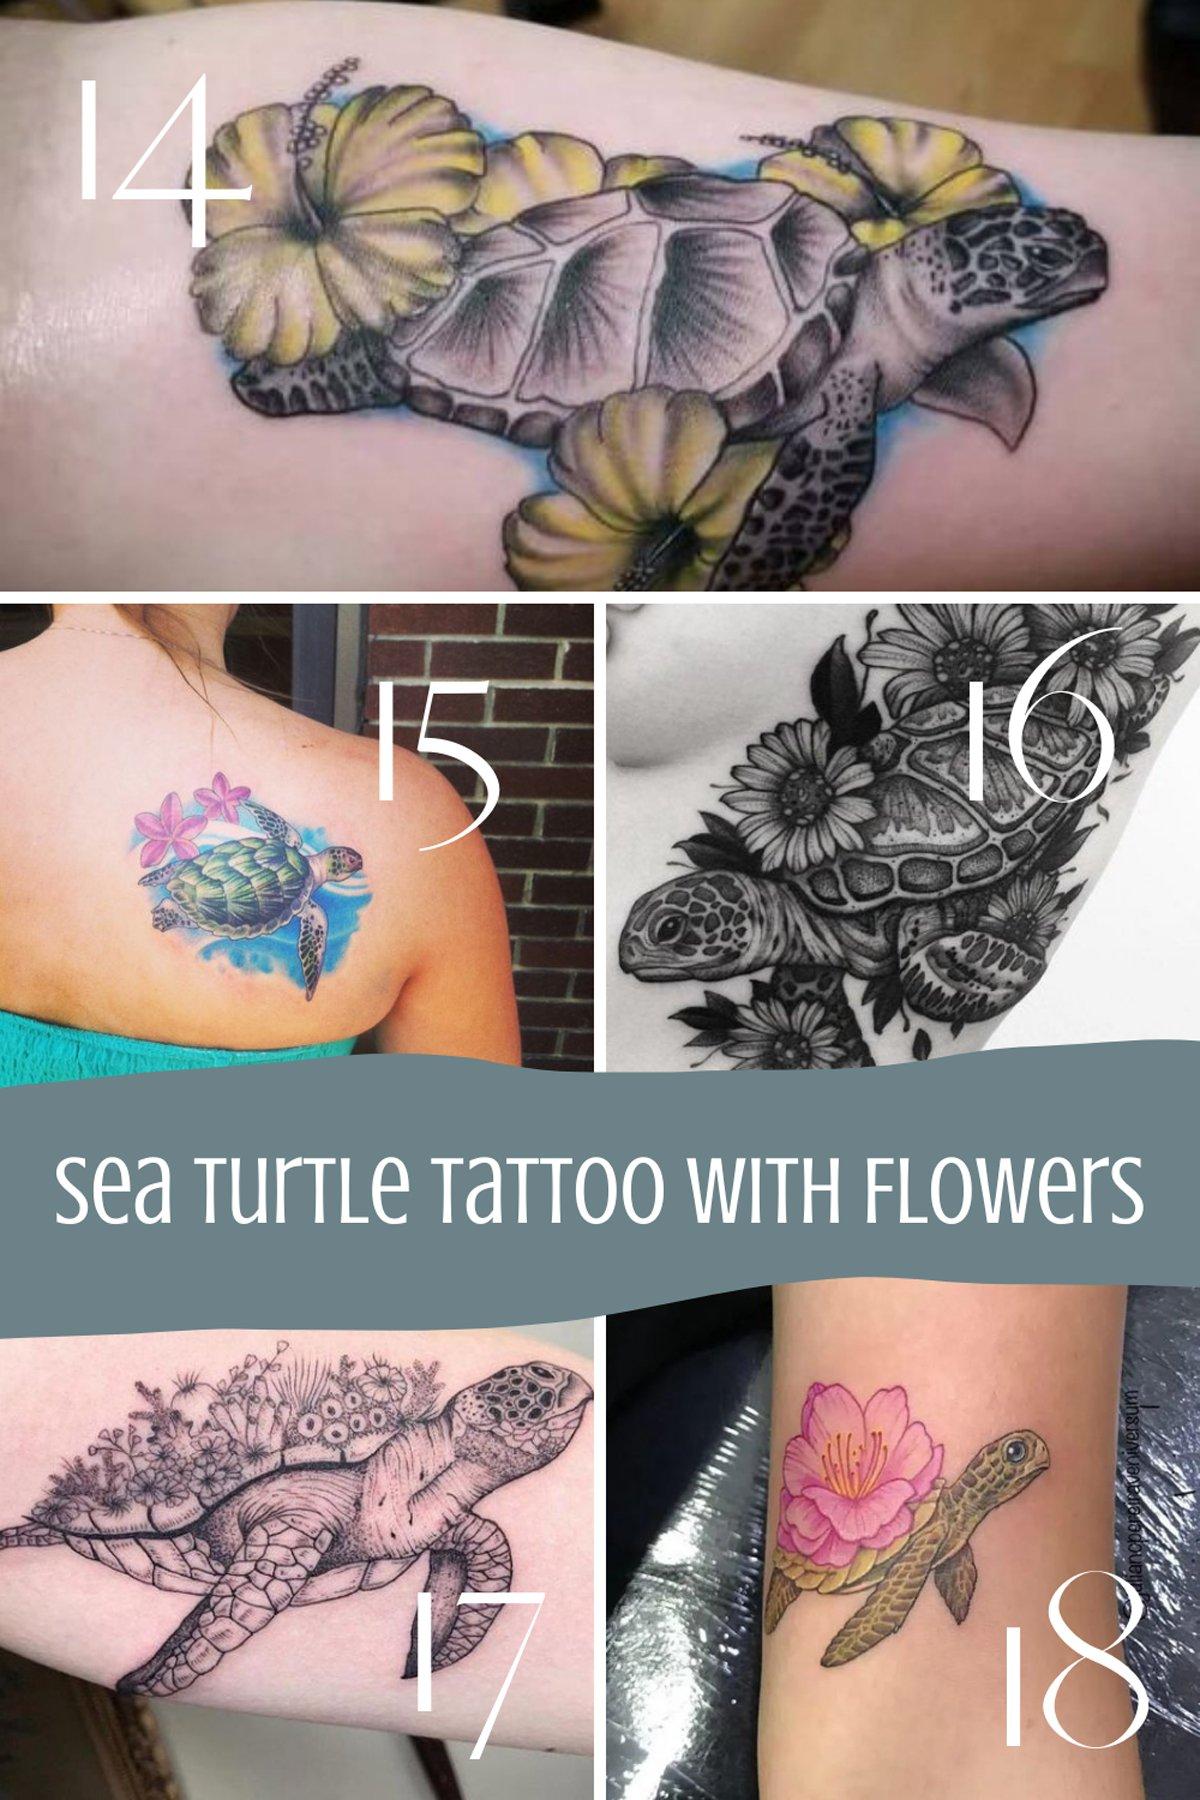 Sea Turtle Tattoo with Flowers